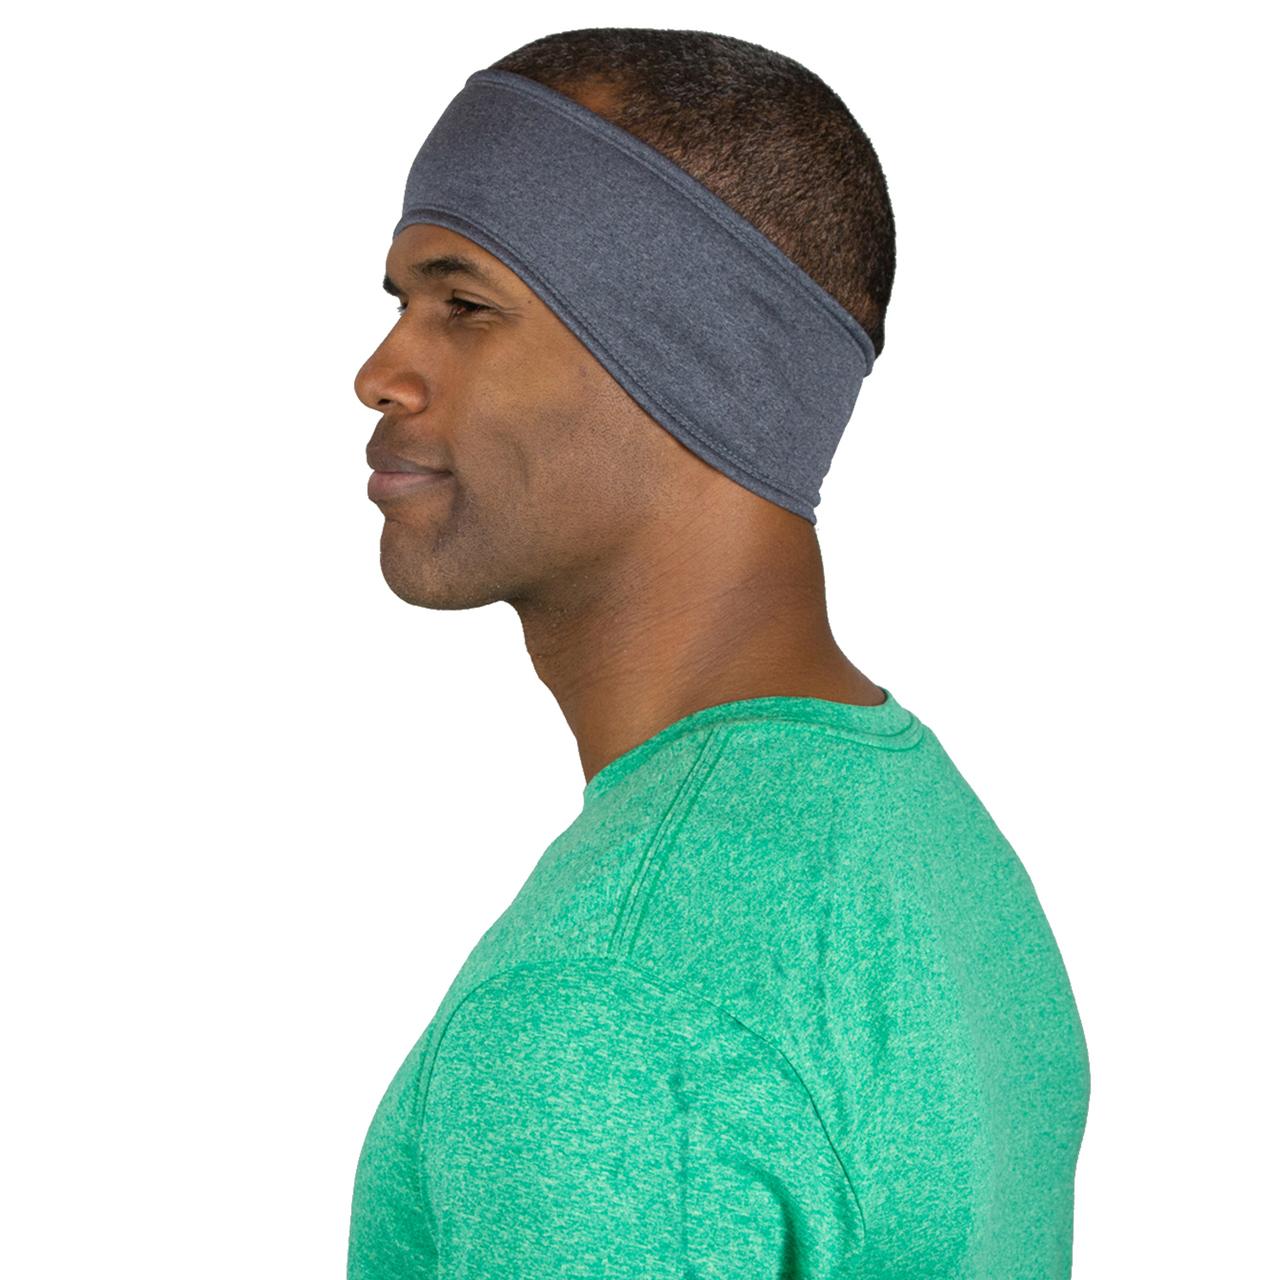 a76d617c ... Winter Running Headband with Moisture Wicking Fabric · heather grey